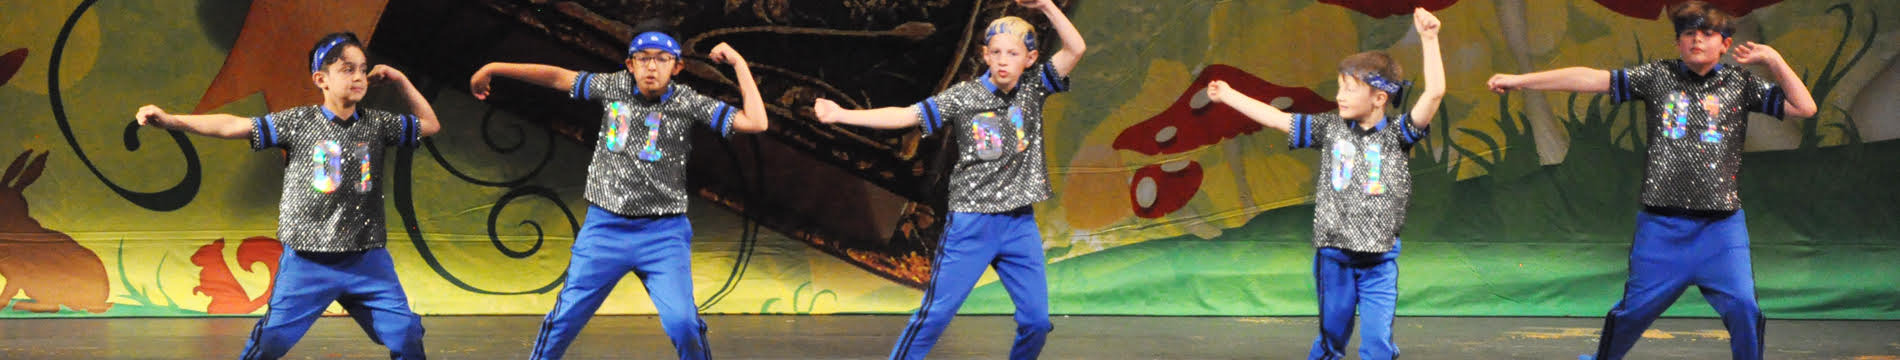 banner-boys-dance